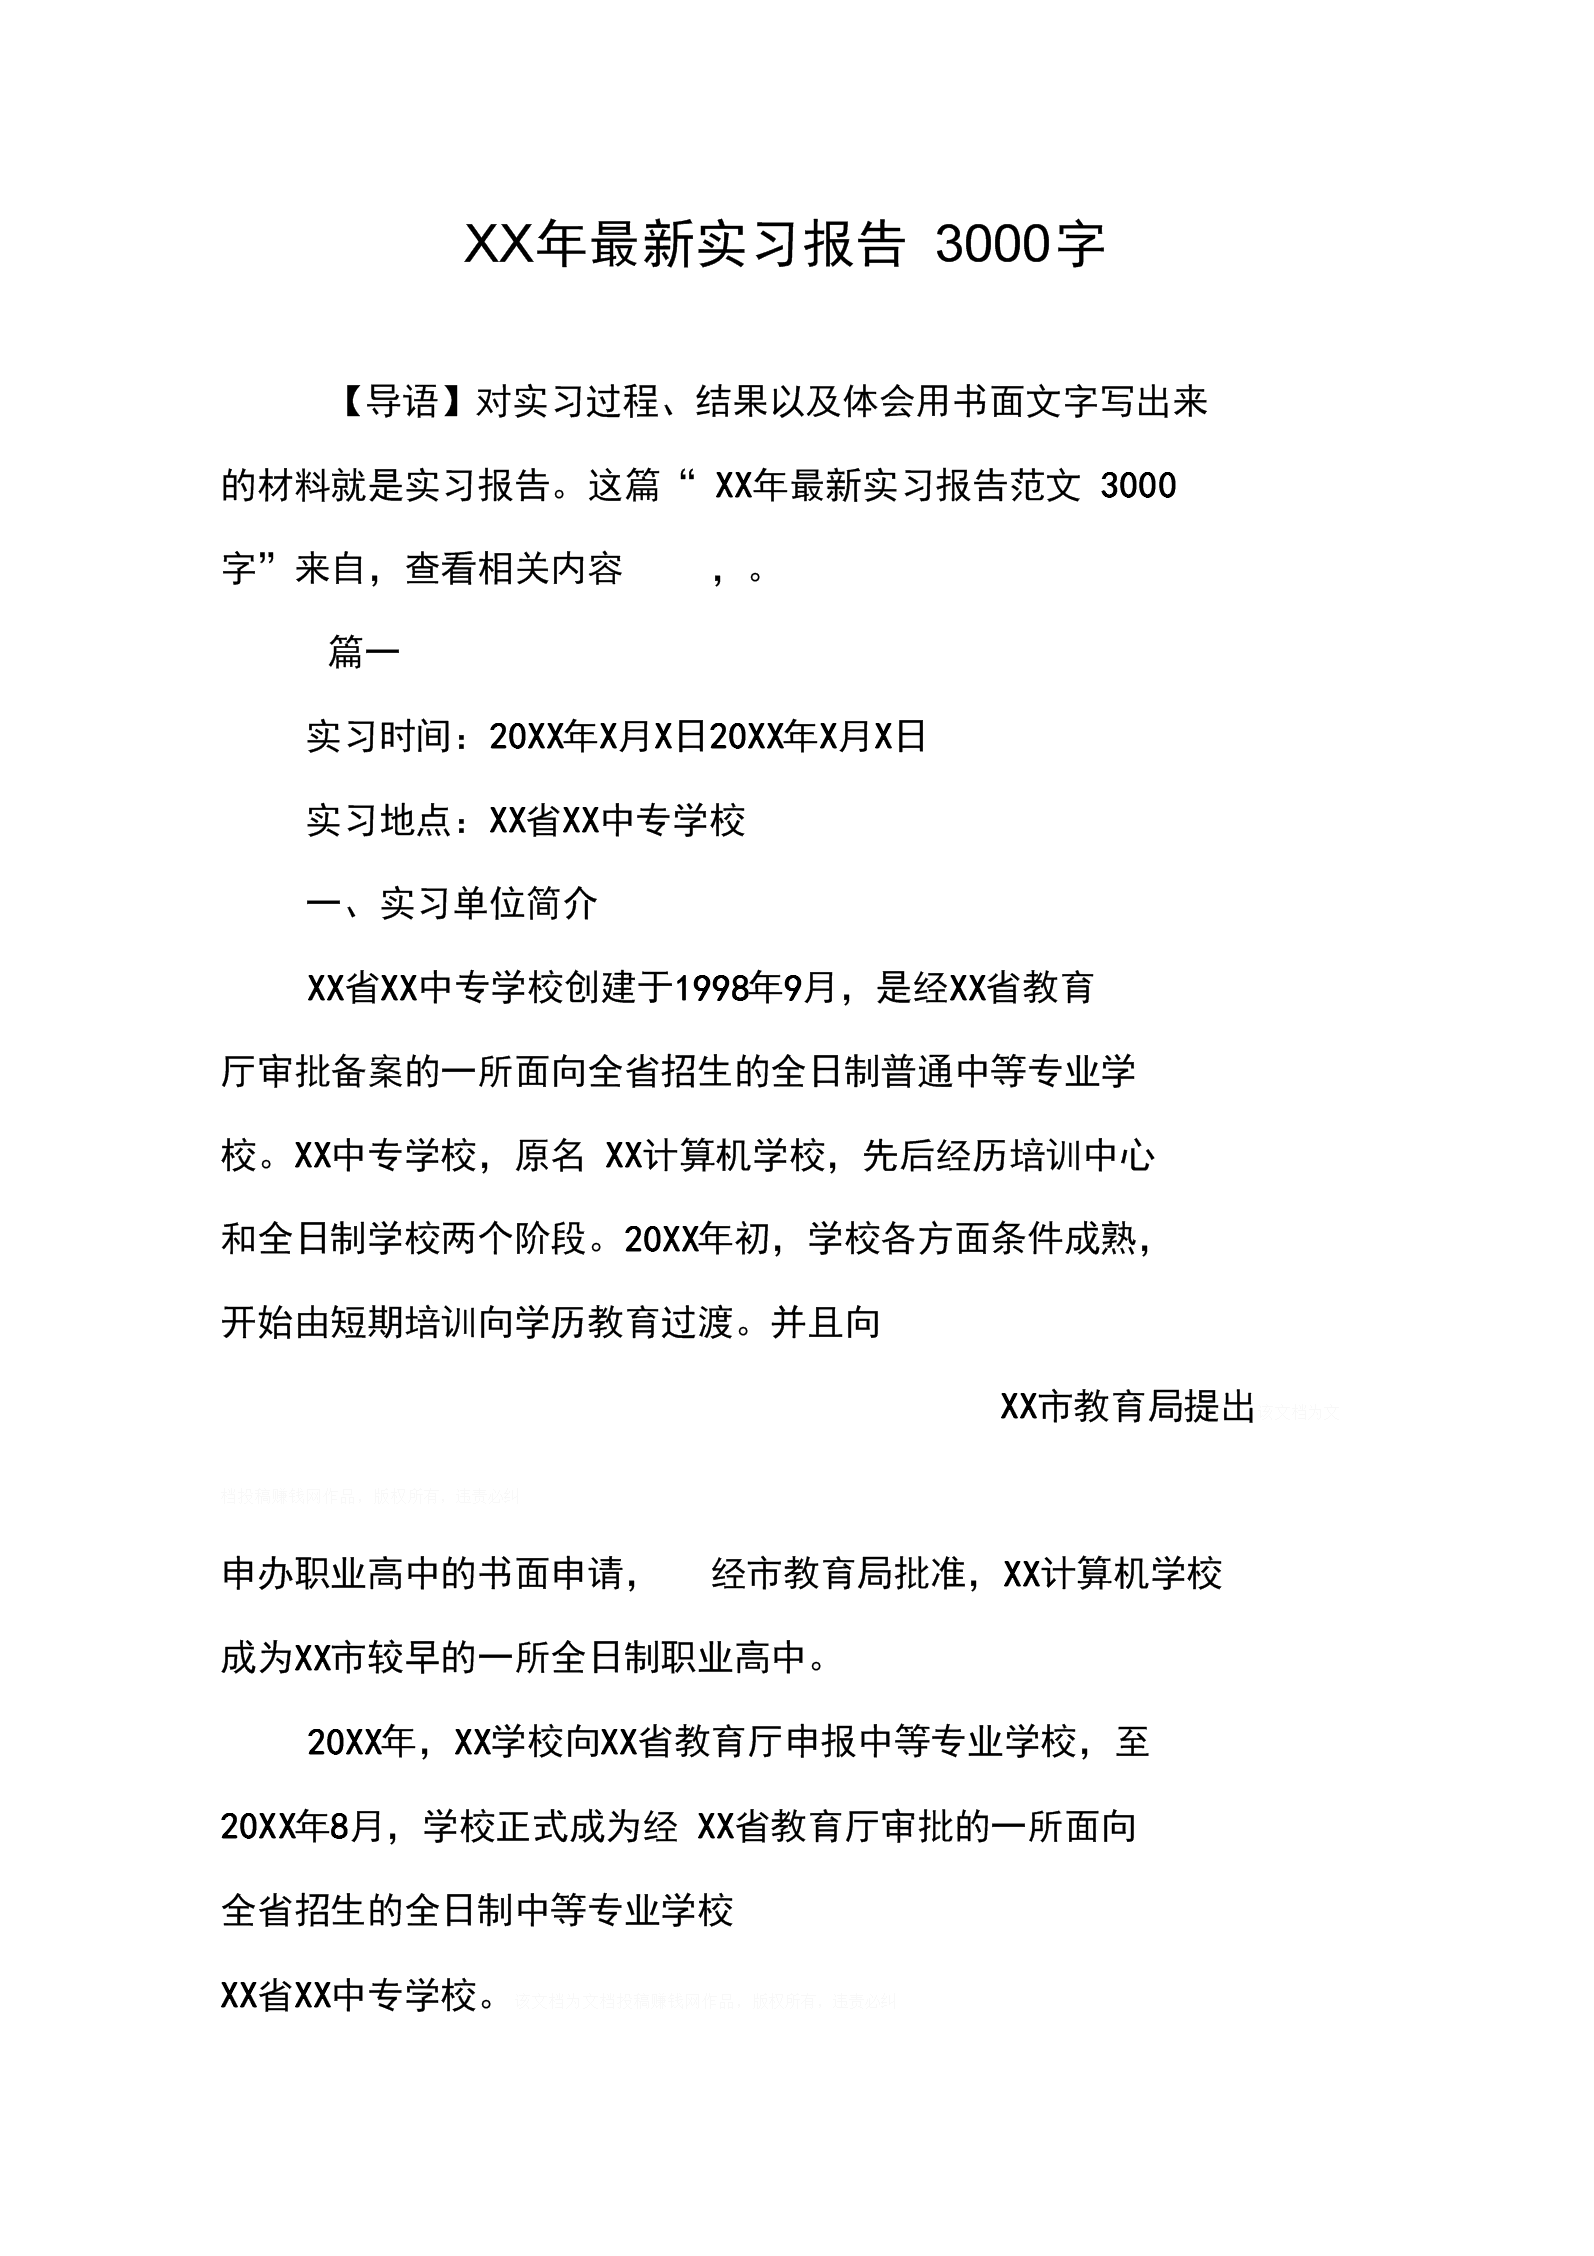 《XX年最新实习报告3000字》.docx